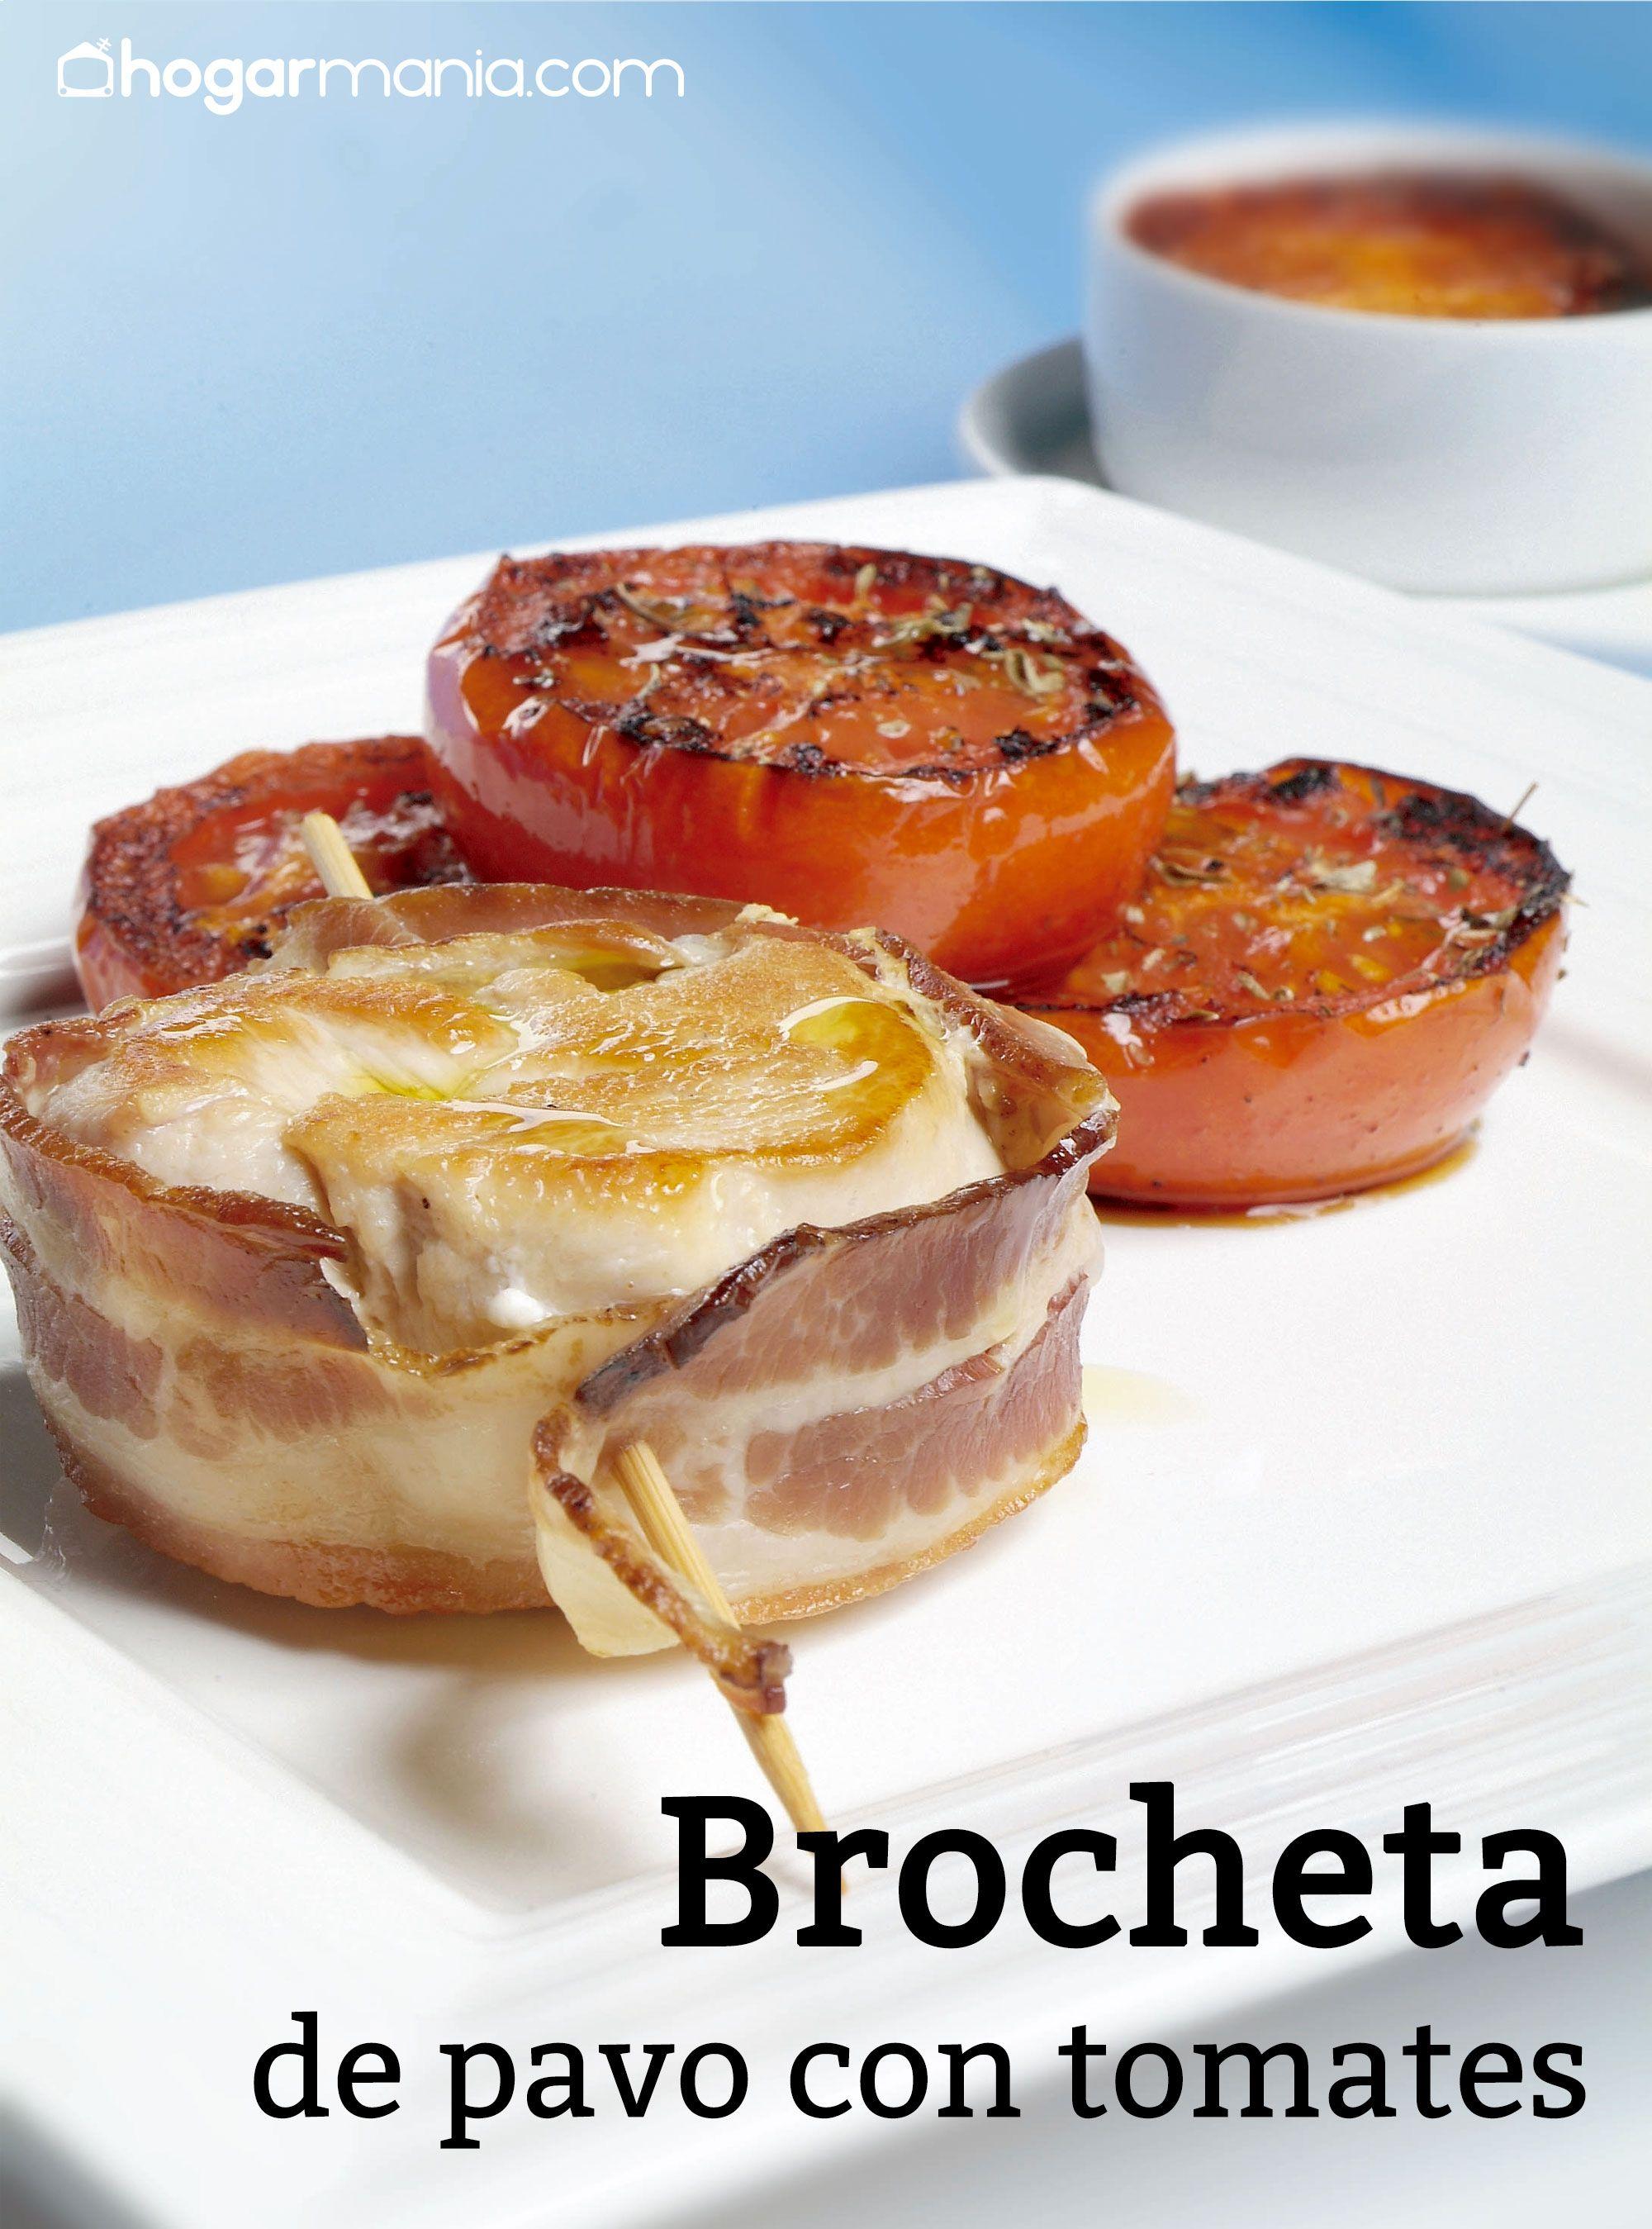 Brocheta de pavo con tomates